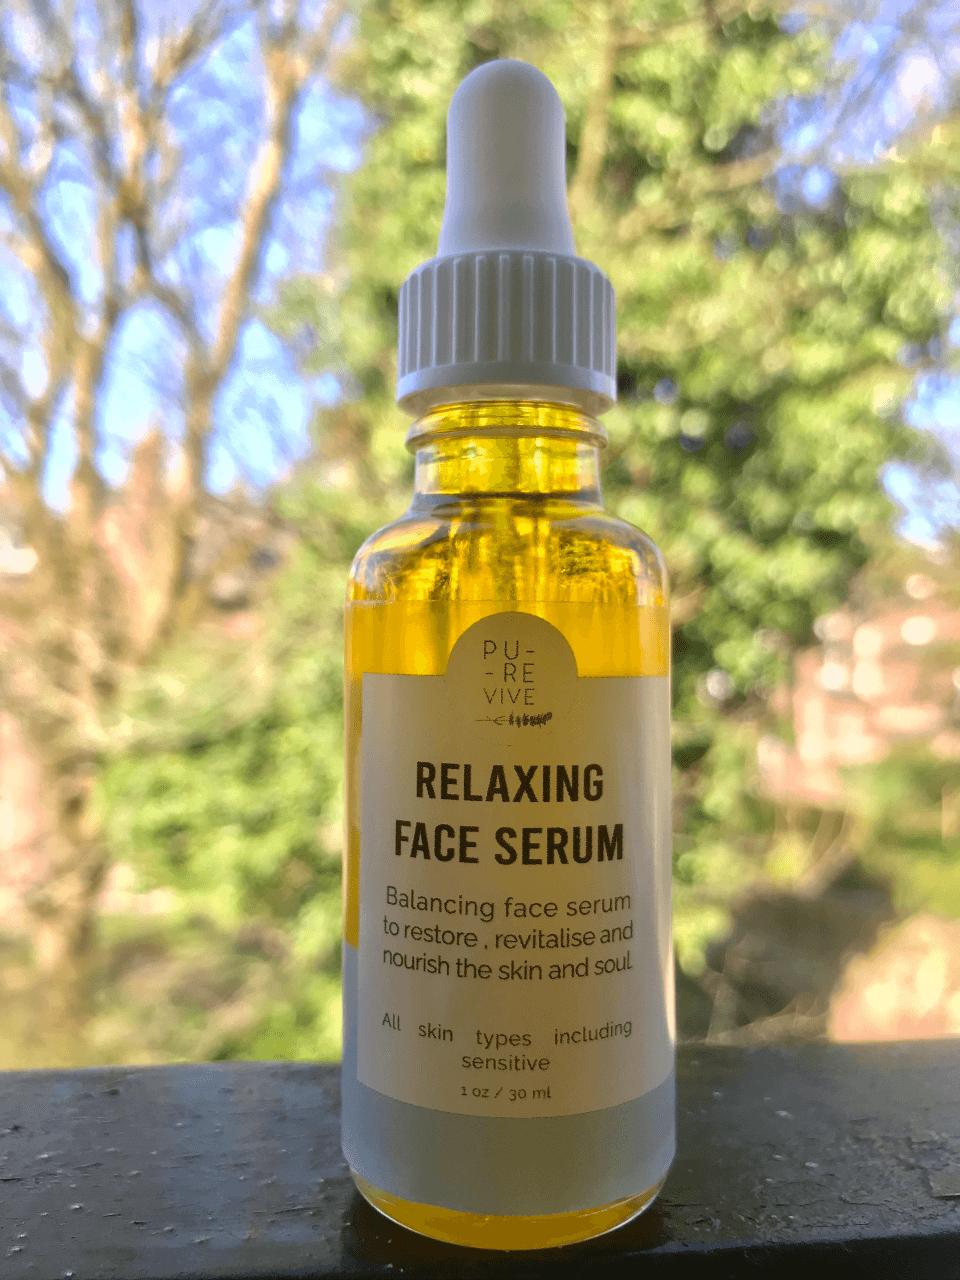 Relaxing Face Serum Kind Shop 2